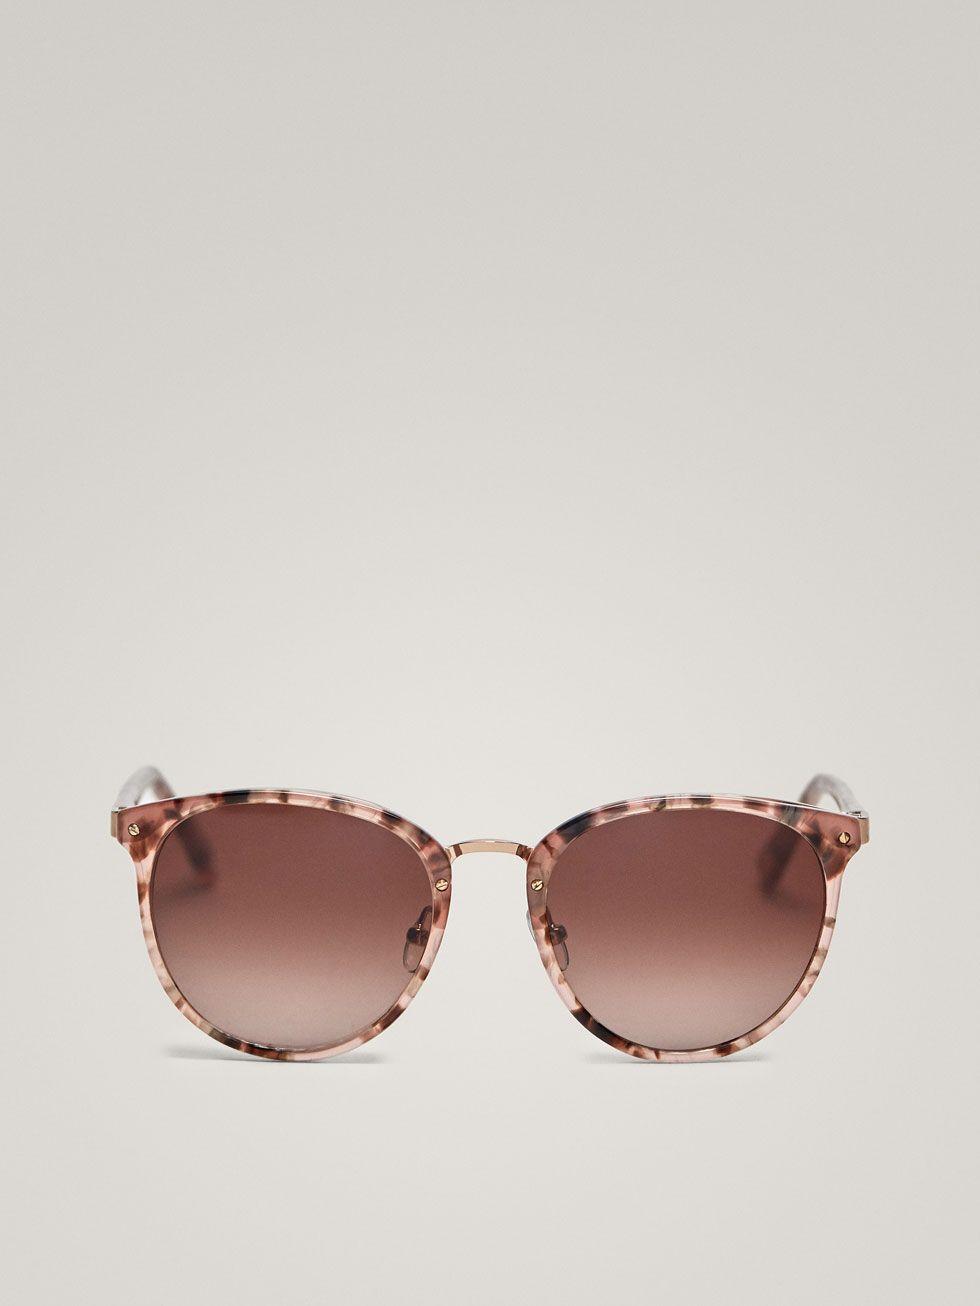 Dutti Gafas Sol Primavera MujerMassimo Glasses 2018 De Verano n0wOXP8k